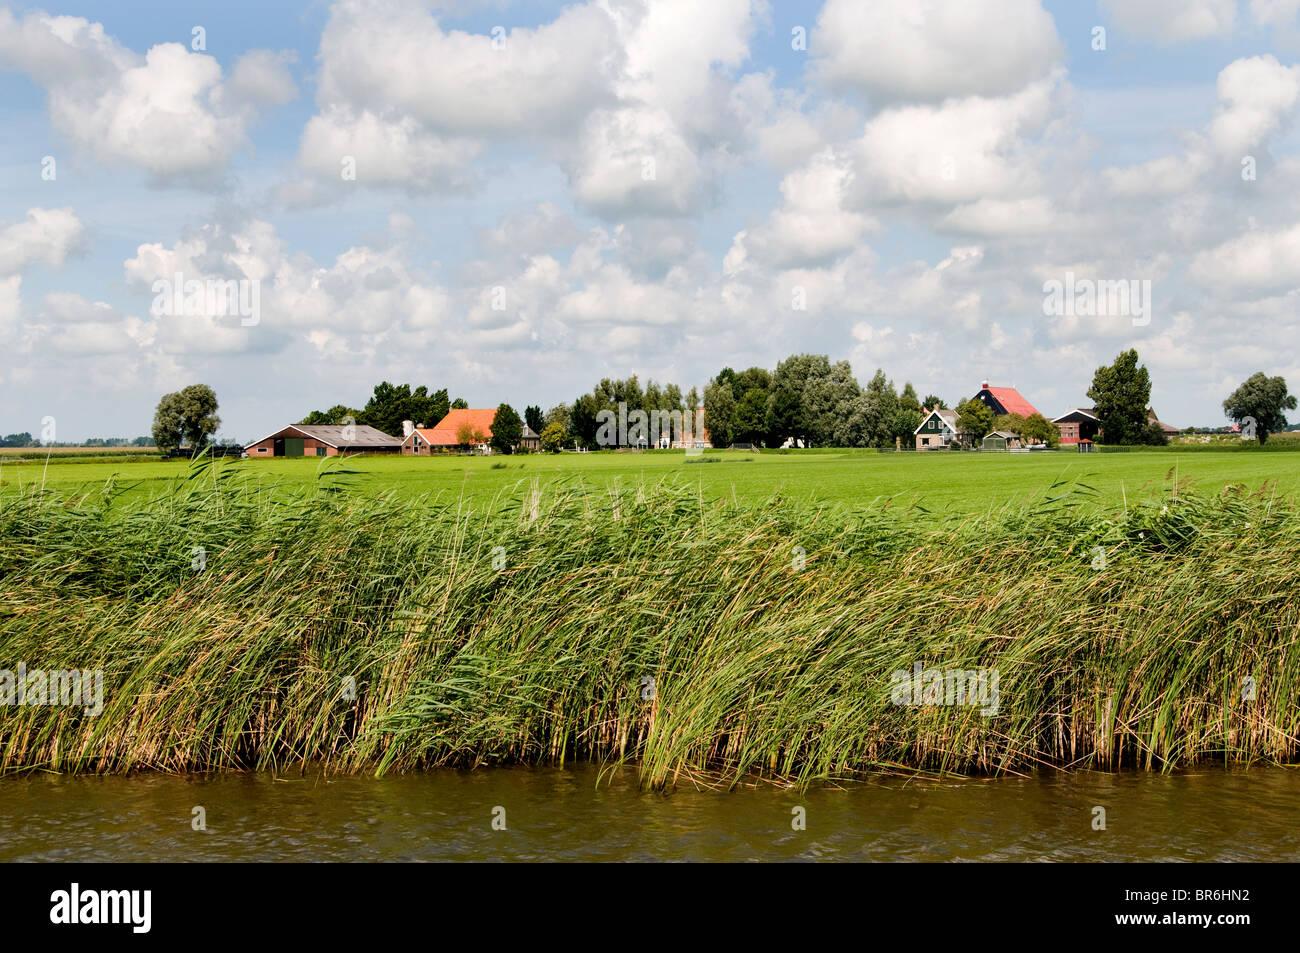 Casa de granja granjero cría Frisia Holanda Imagen De Stock